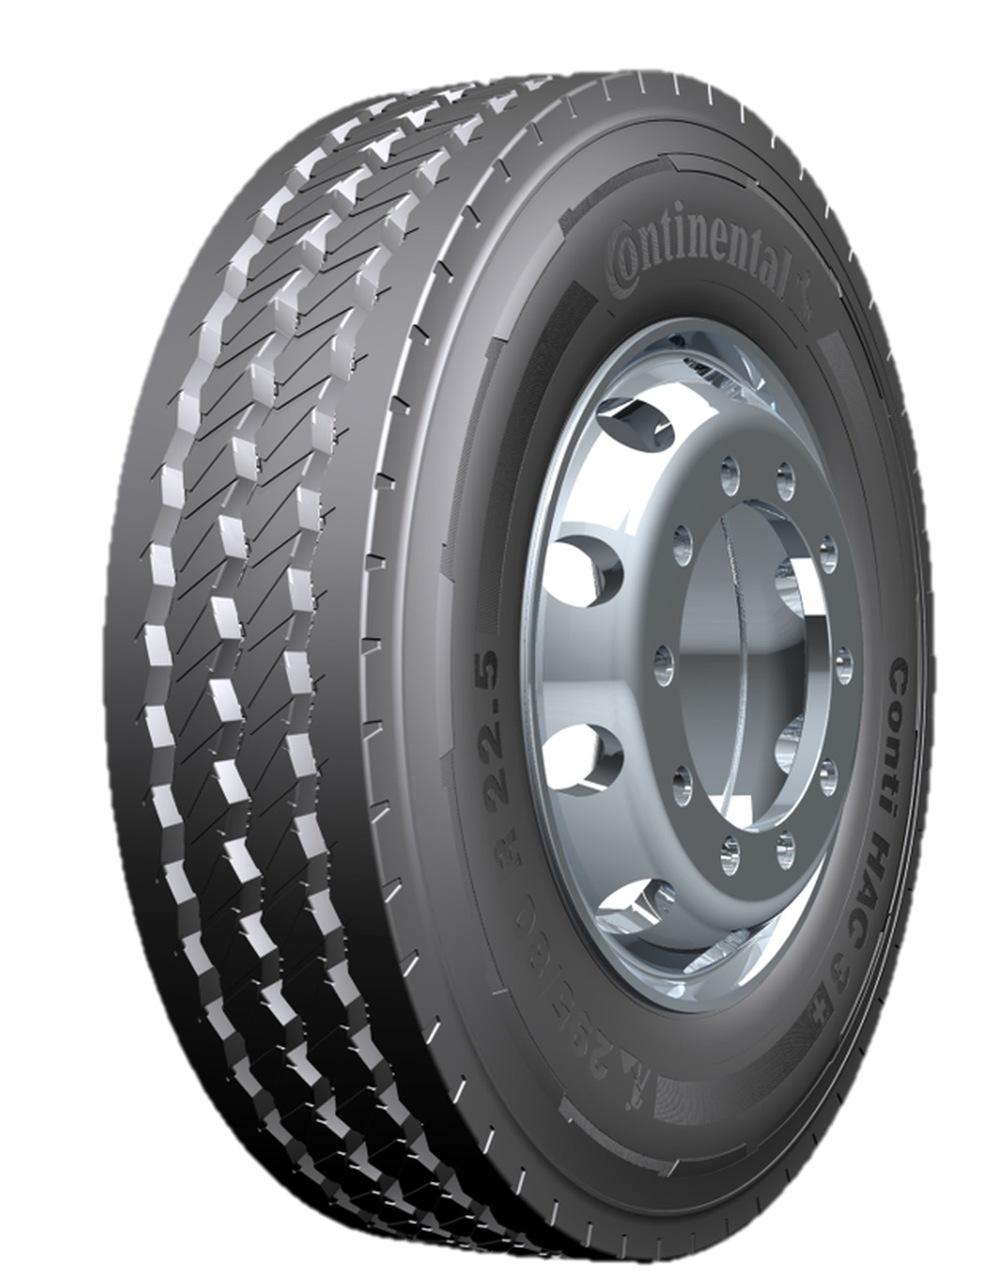 Continental lança o pneu ´inteligente`Conti HAC 3